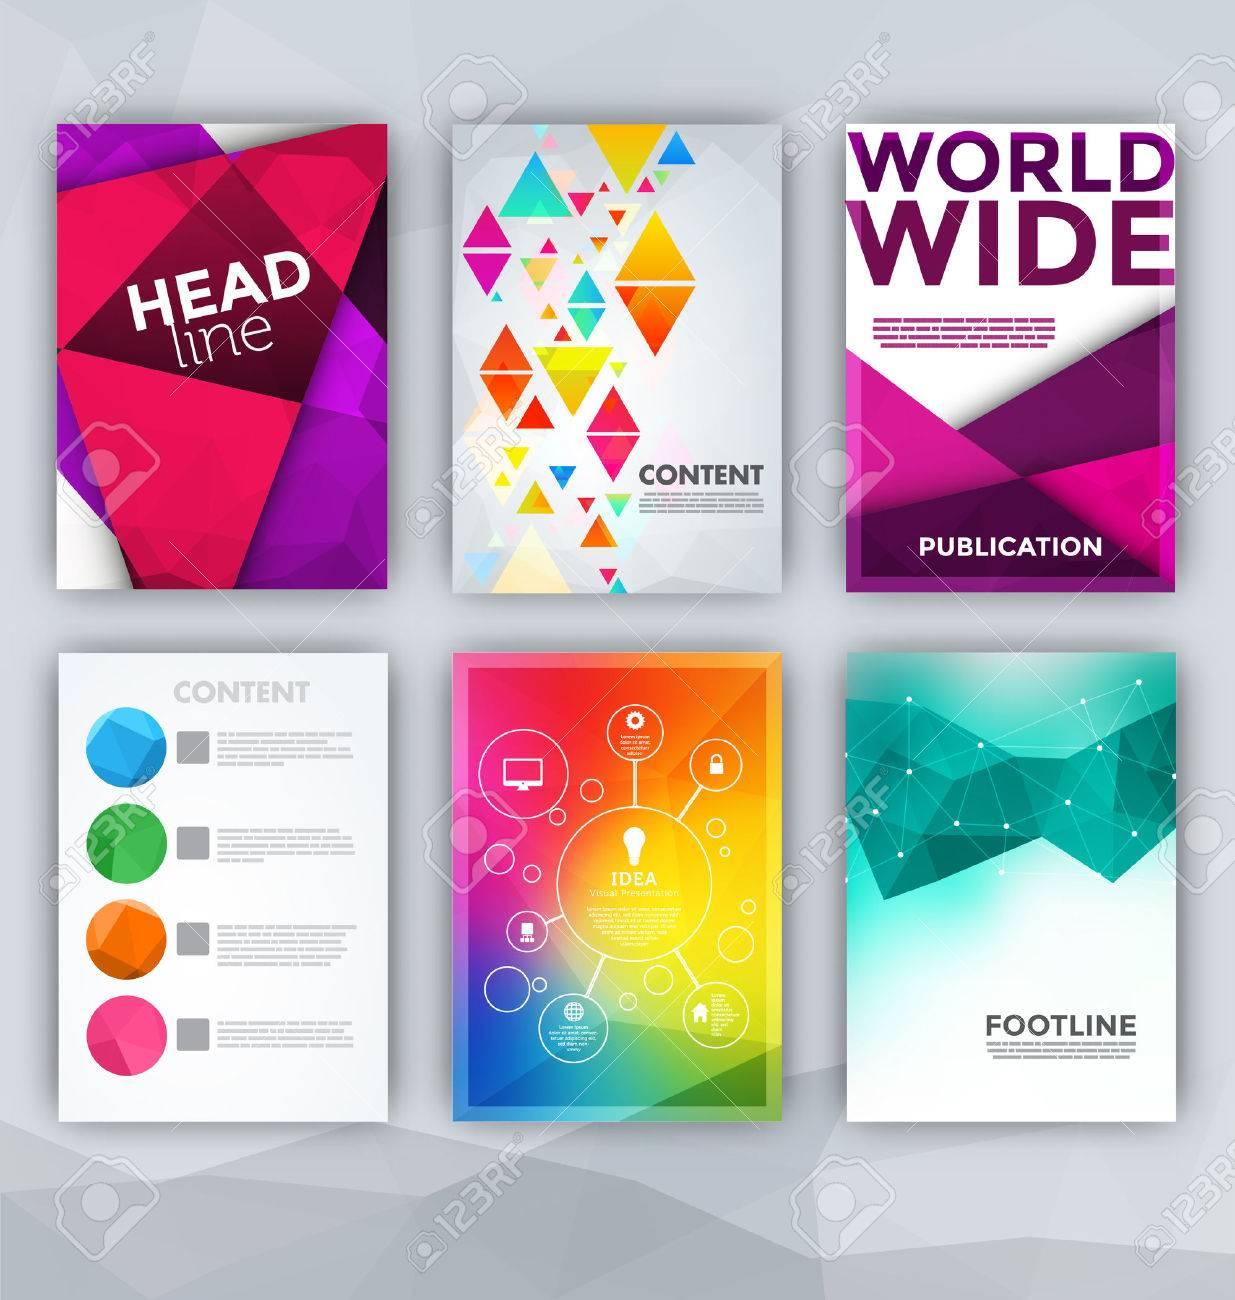 Flyer Sets - Abstract Backgrounds - Presentation Template - Brochure Print Design Elements - 35893245